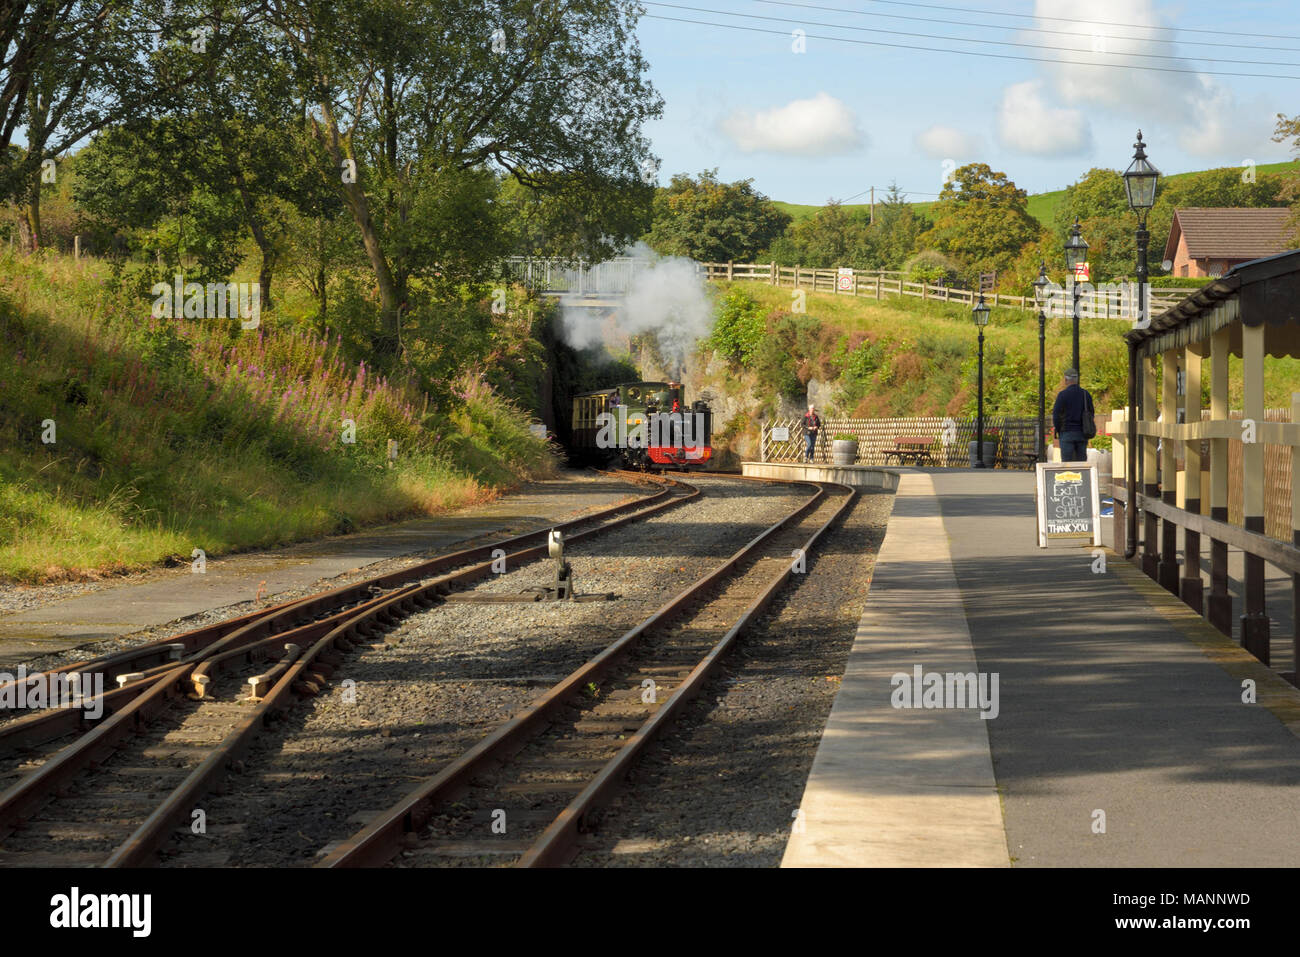 Great Western Engine approaches Devil's Bridge Station on the Vale of Rheidol Railway - Stock Image